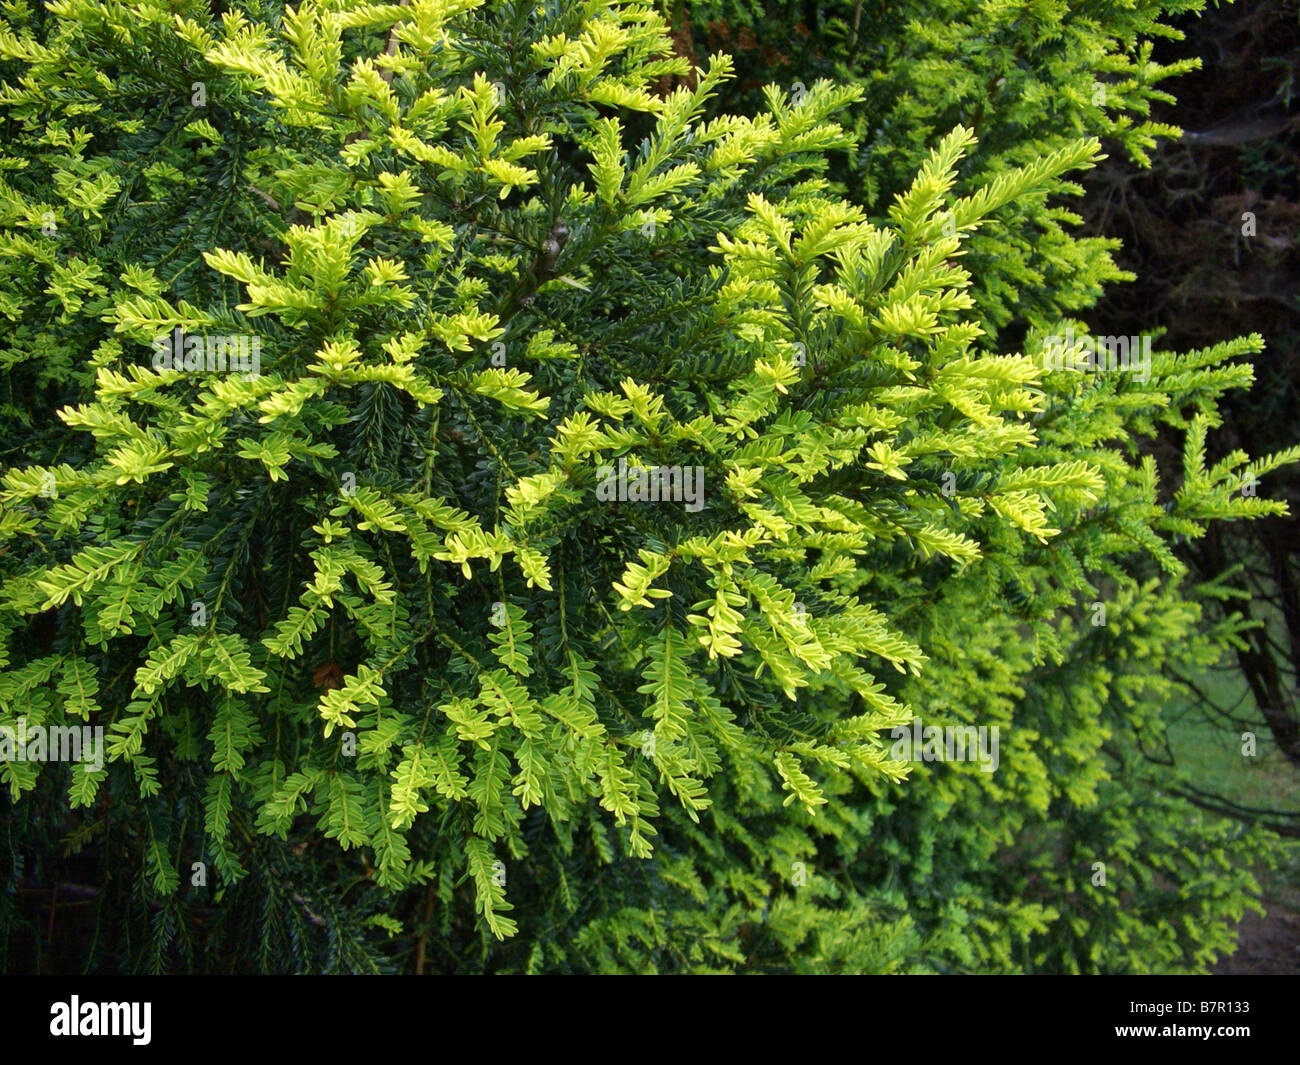 Common yew (Taxus baccata 'Adpressa Aurea', Taxus baccata Adpressa Aurea), sort Adpressa Aurea - Stock Image